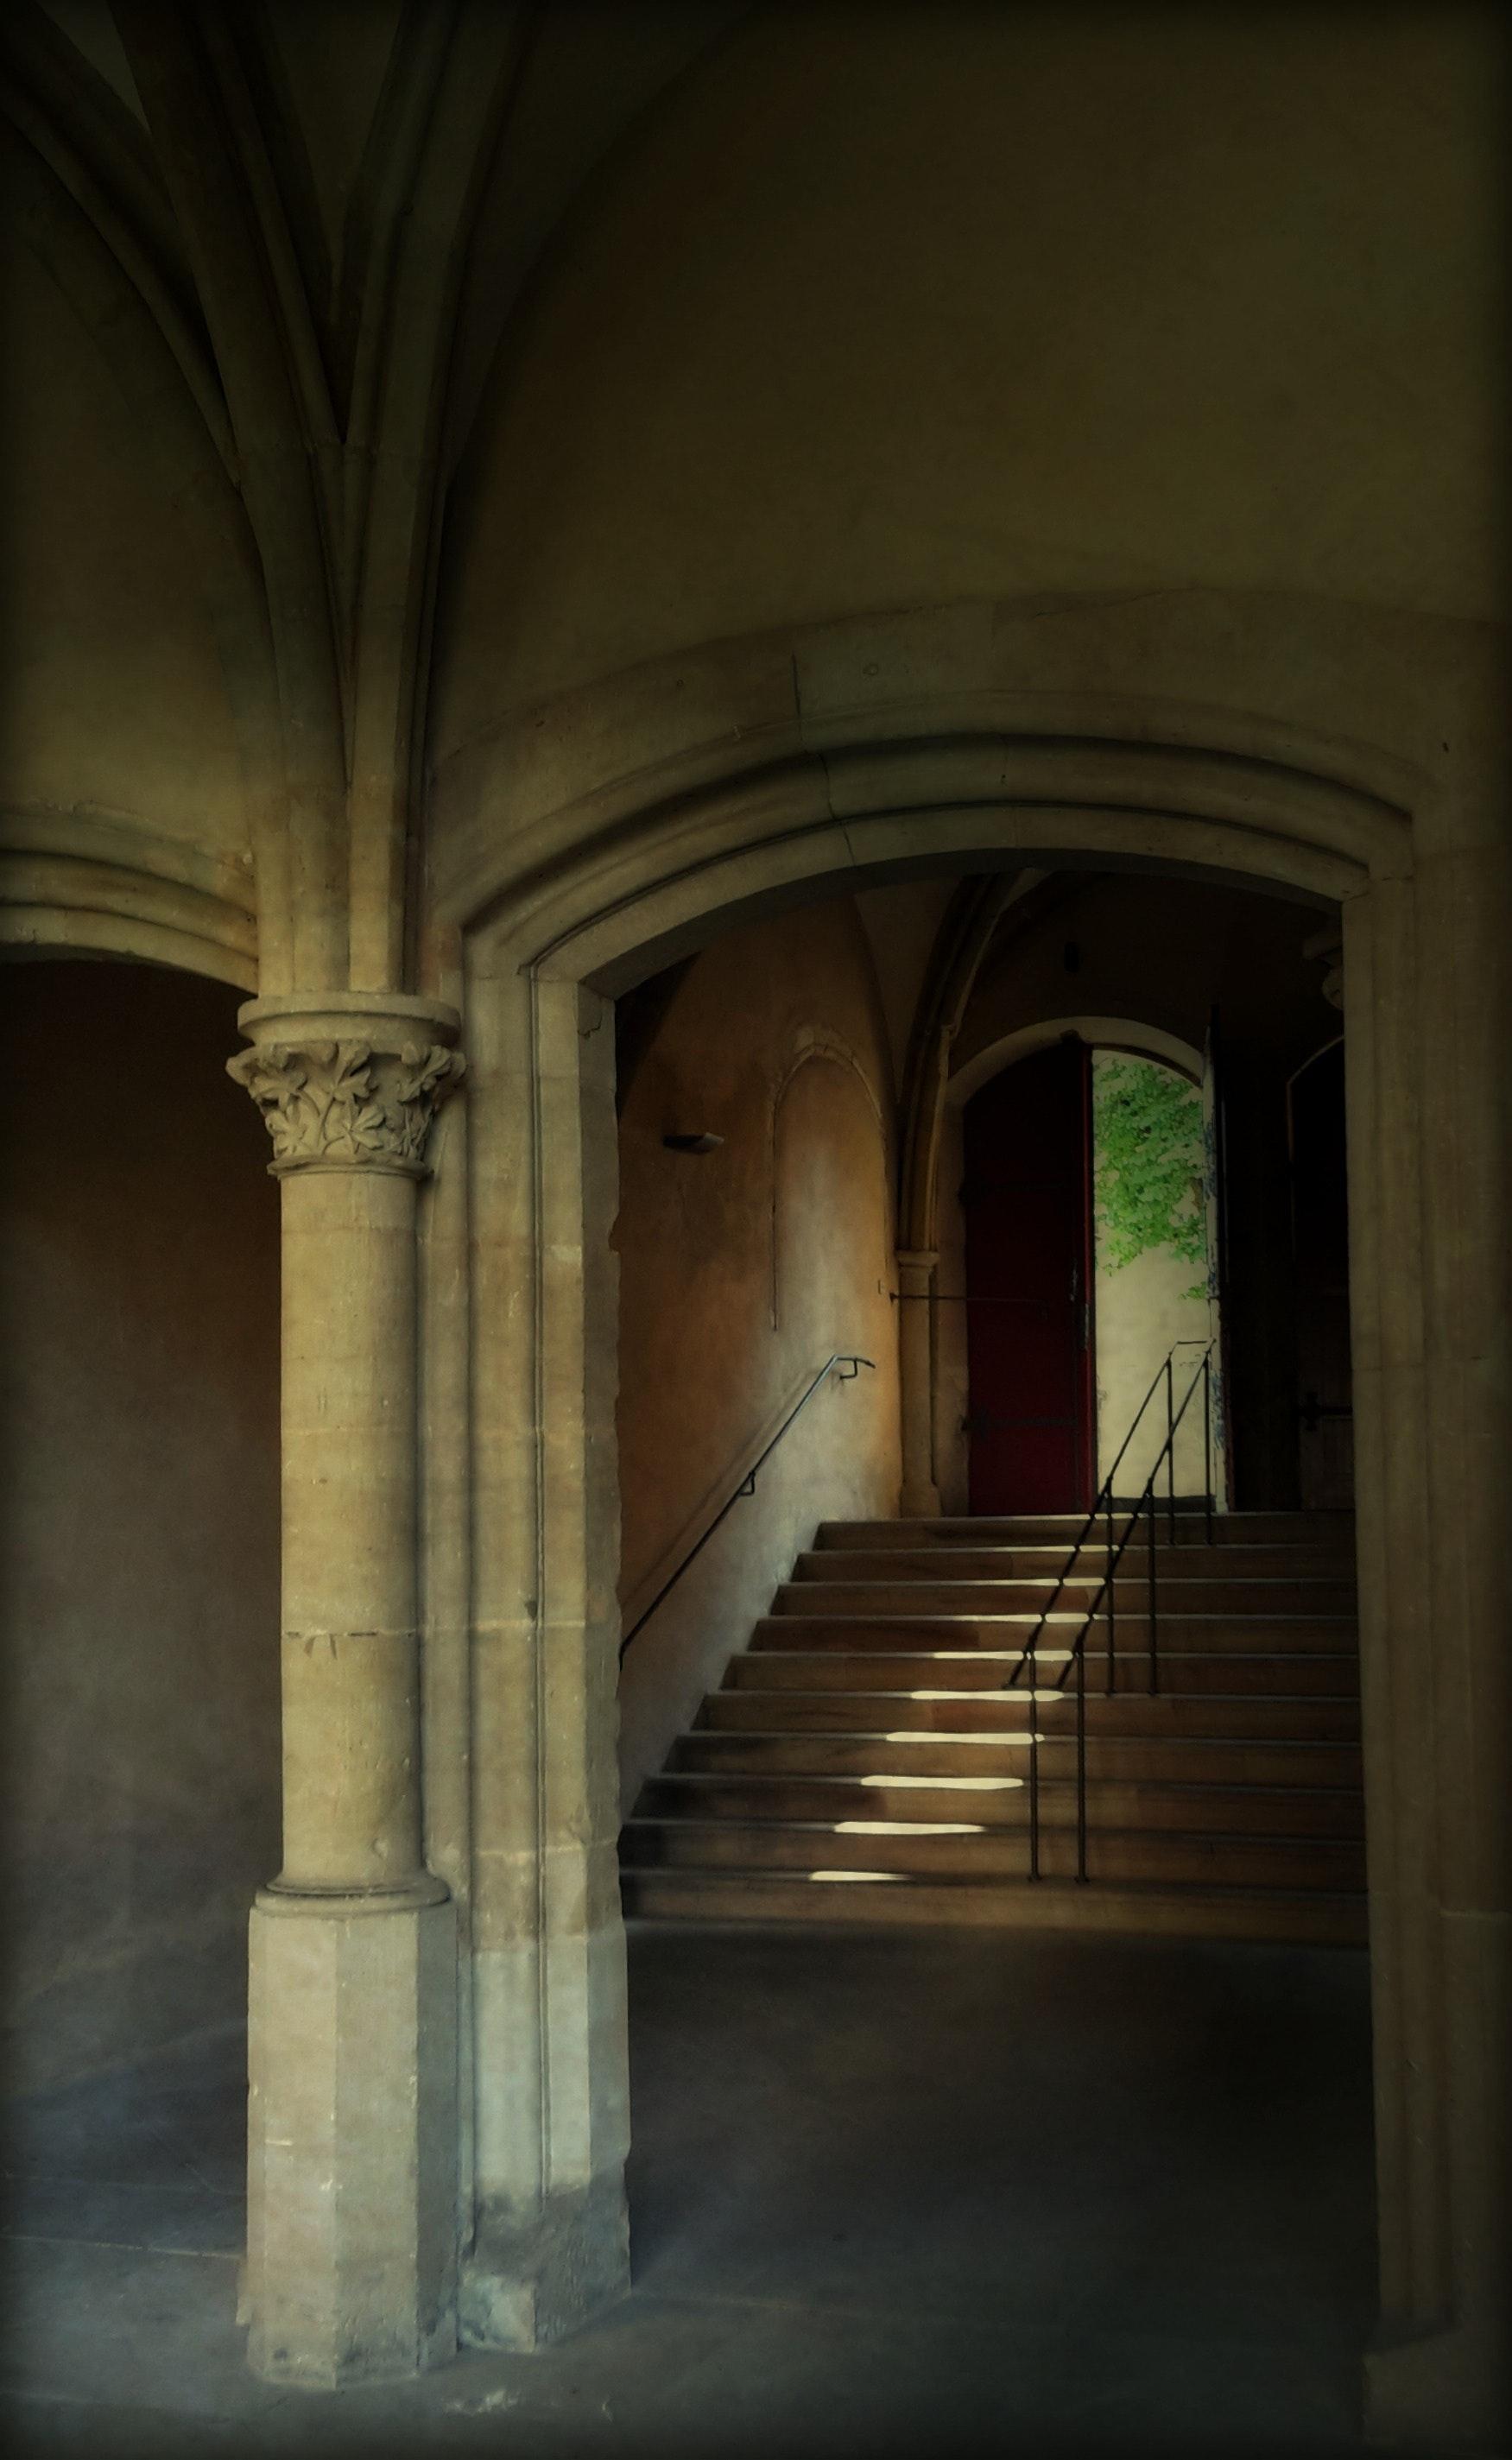 ancient-antique-arcades-161227.jpg